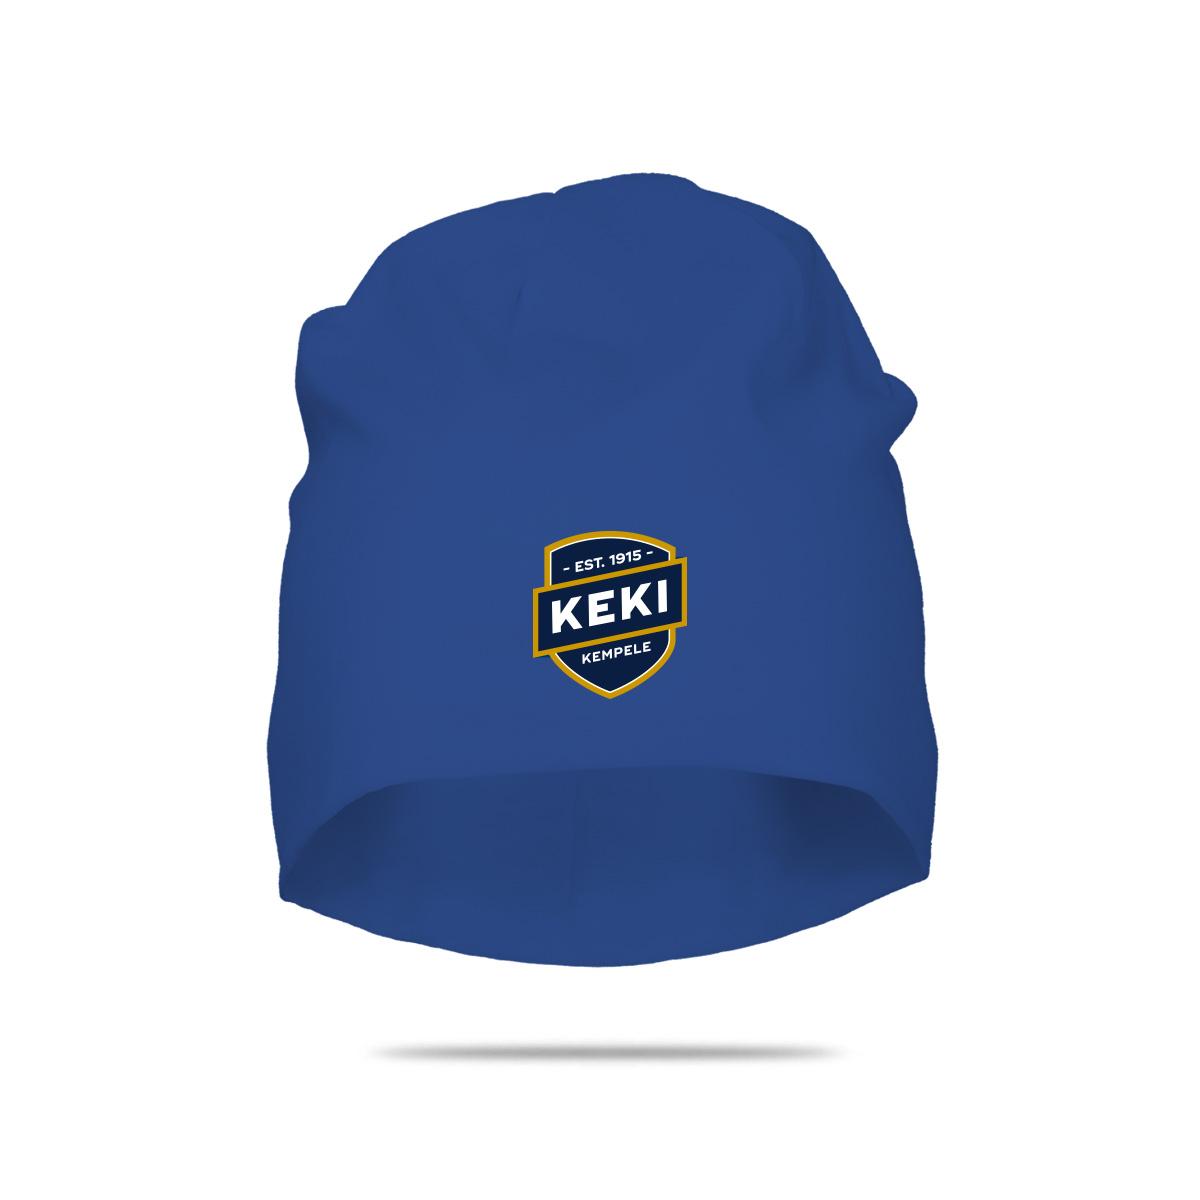 Teamprint-Pujo-Keki-Sininen